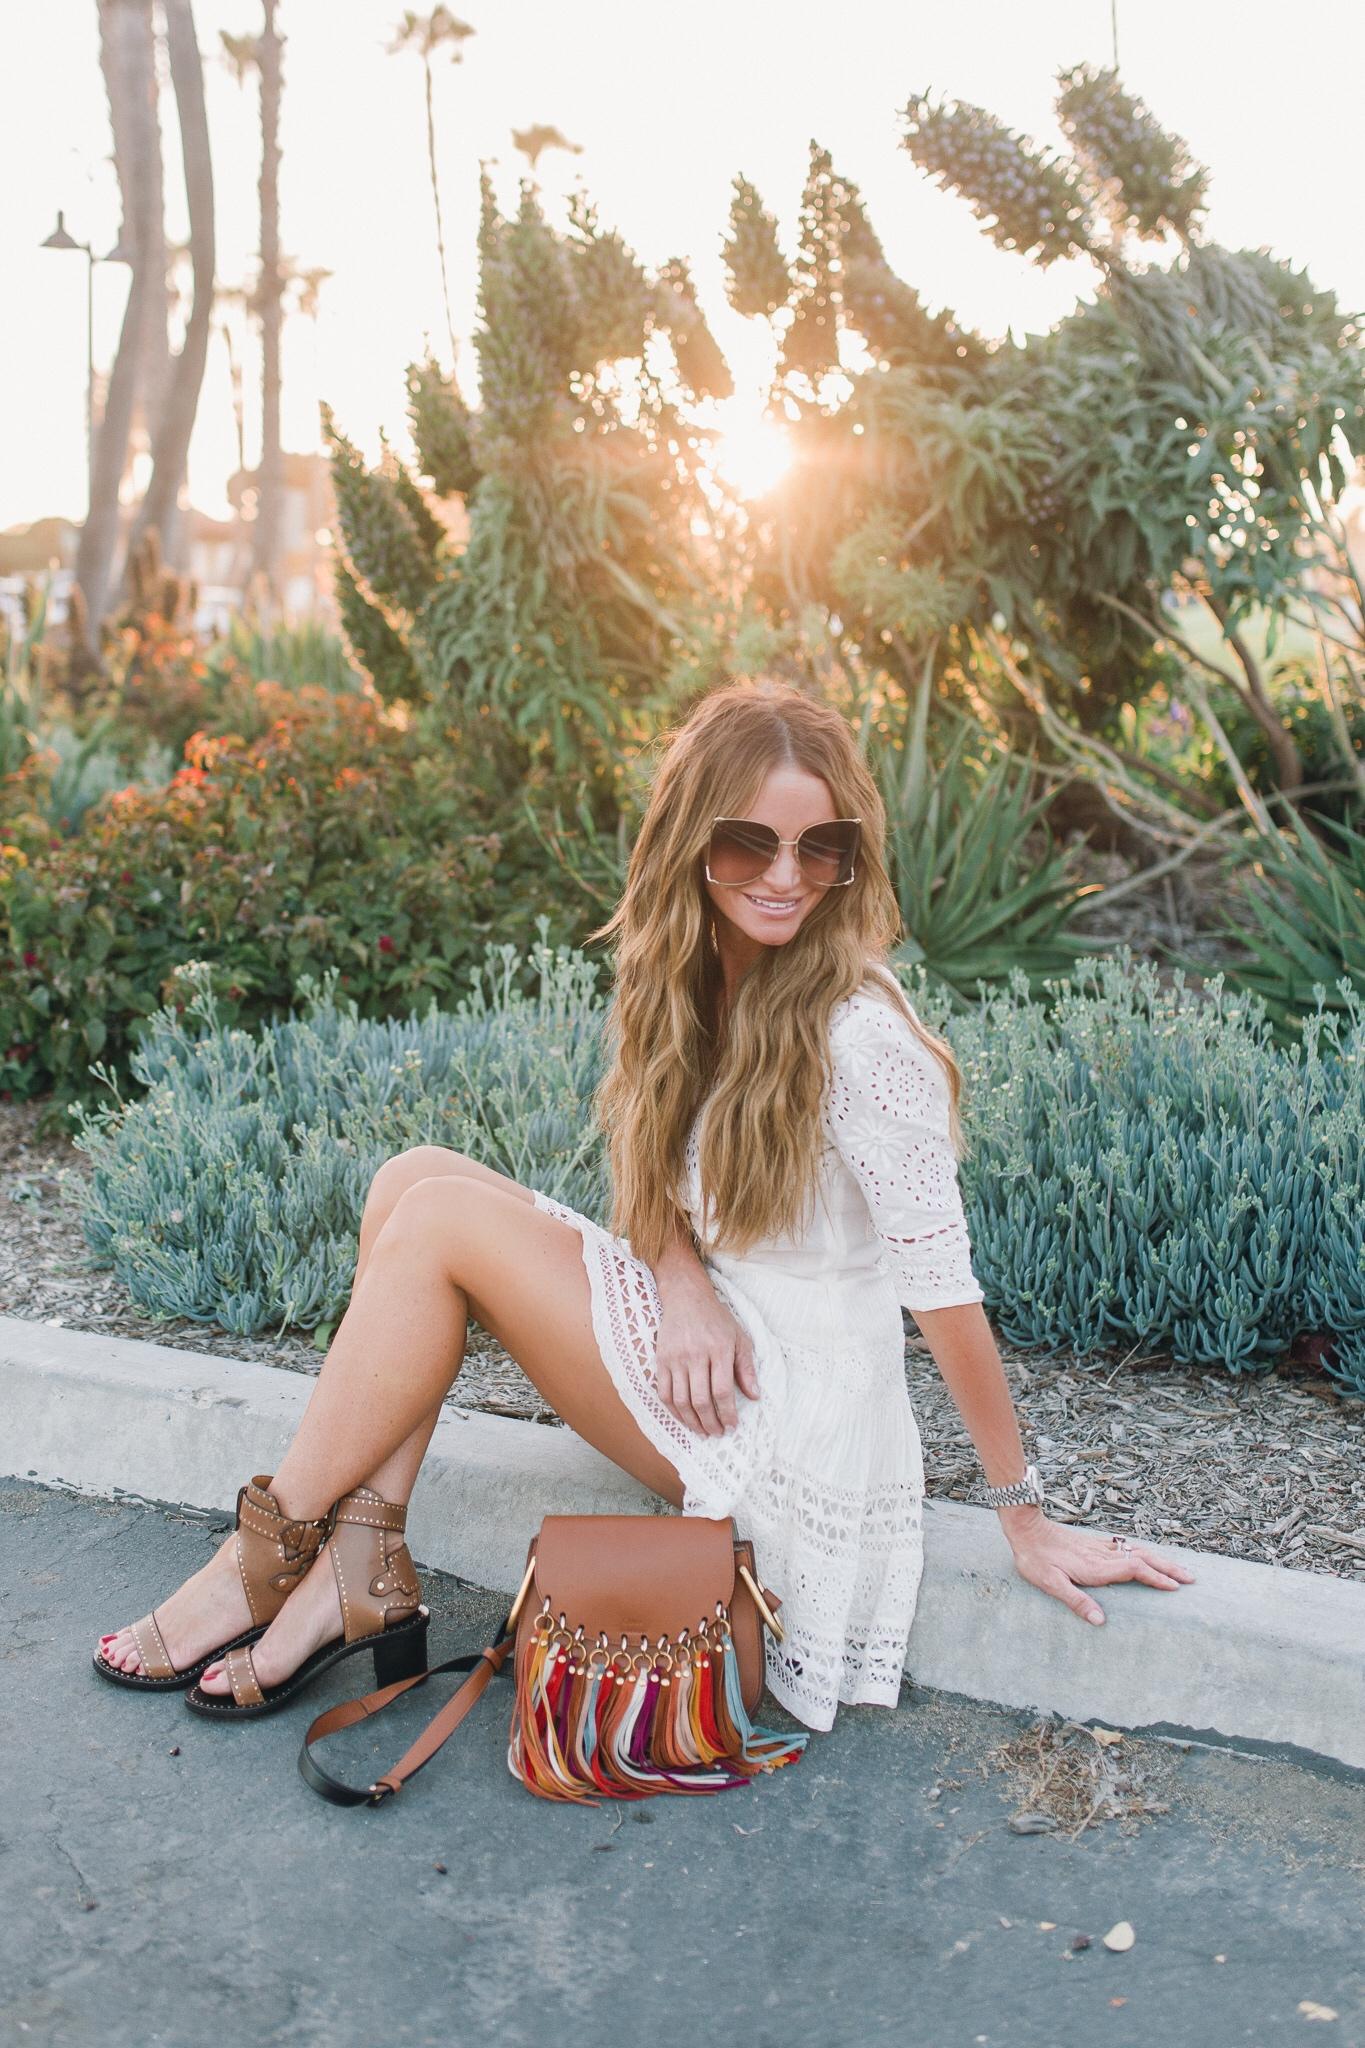 Summer Dresses 2018 - LOVESHACKFANCY Mini Dress - DKW Fashion